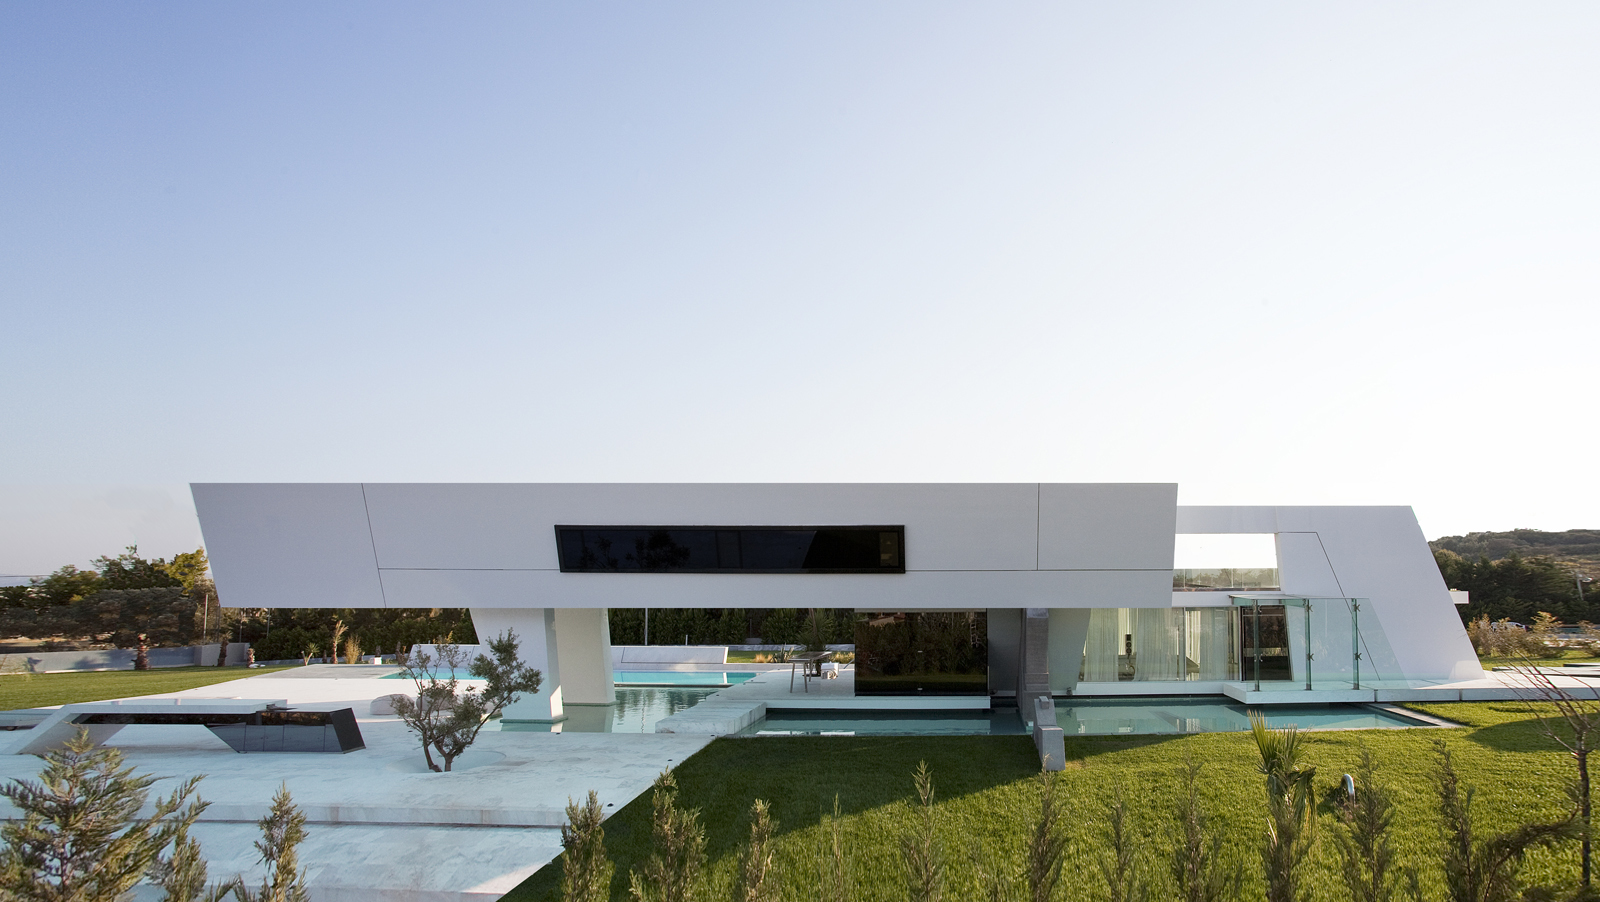 314 architecture studio architecture athens greece pavlos